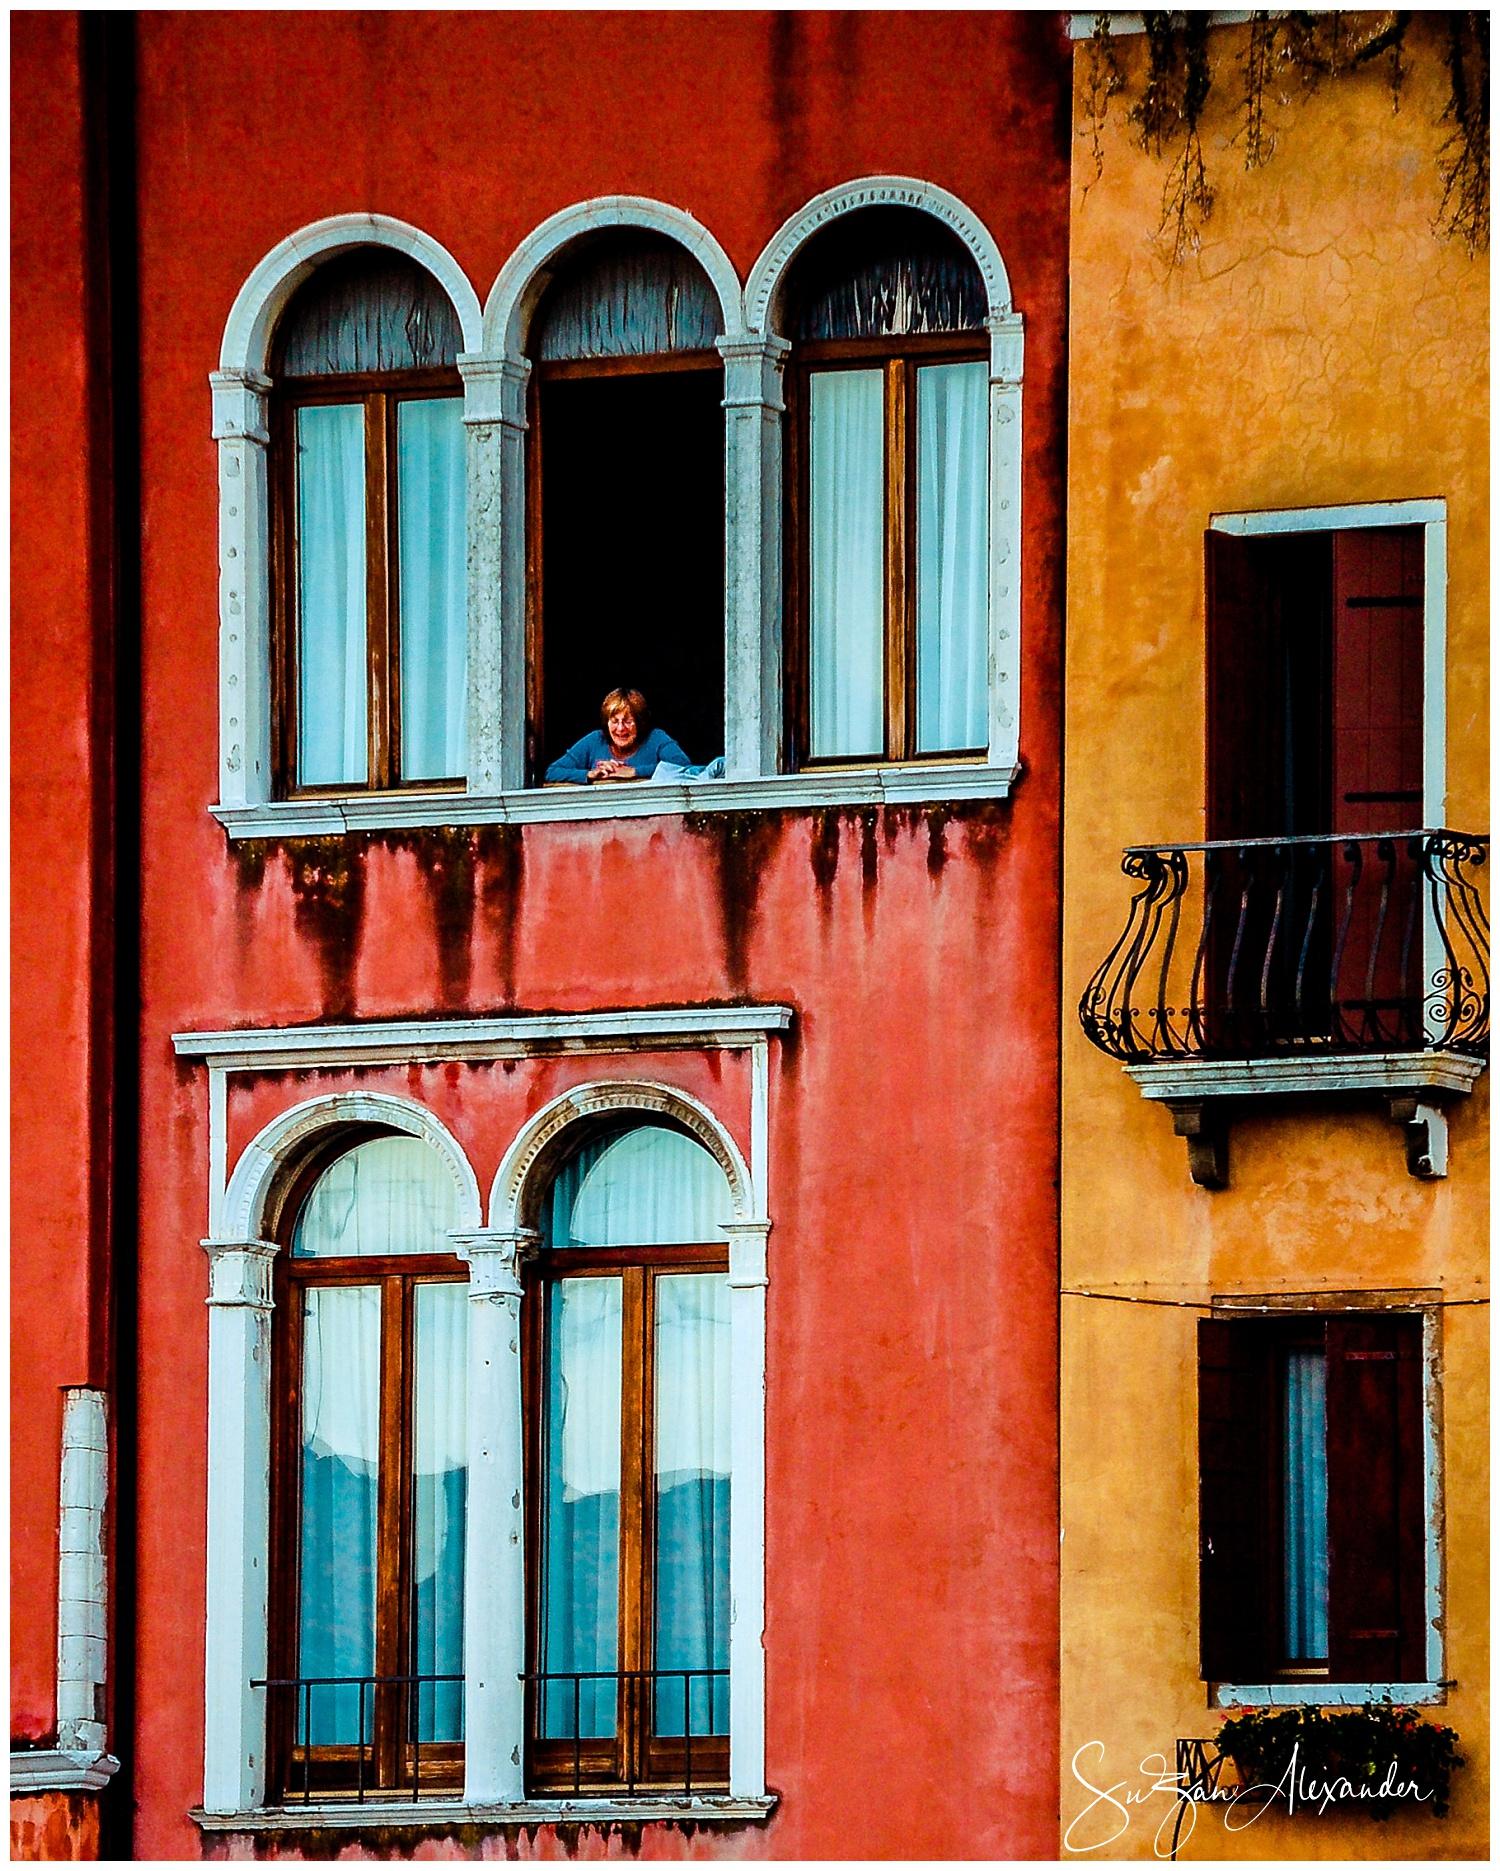 © 2010 SuZan Alexander,   Venice: Hello Down Below  . Digital Photography.